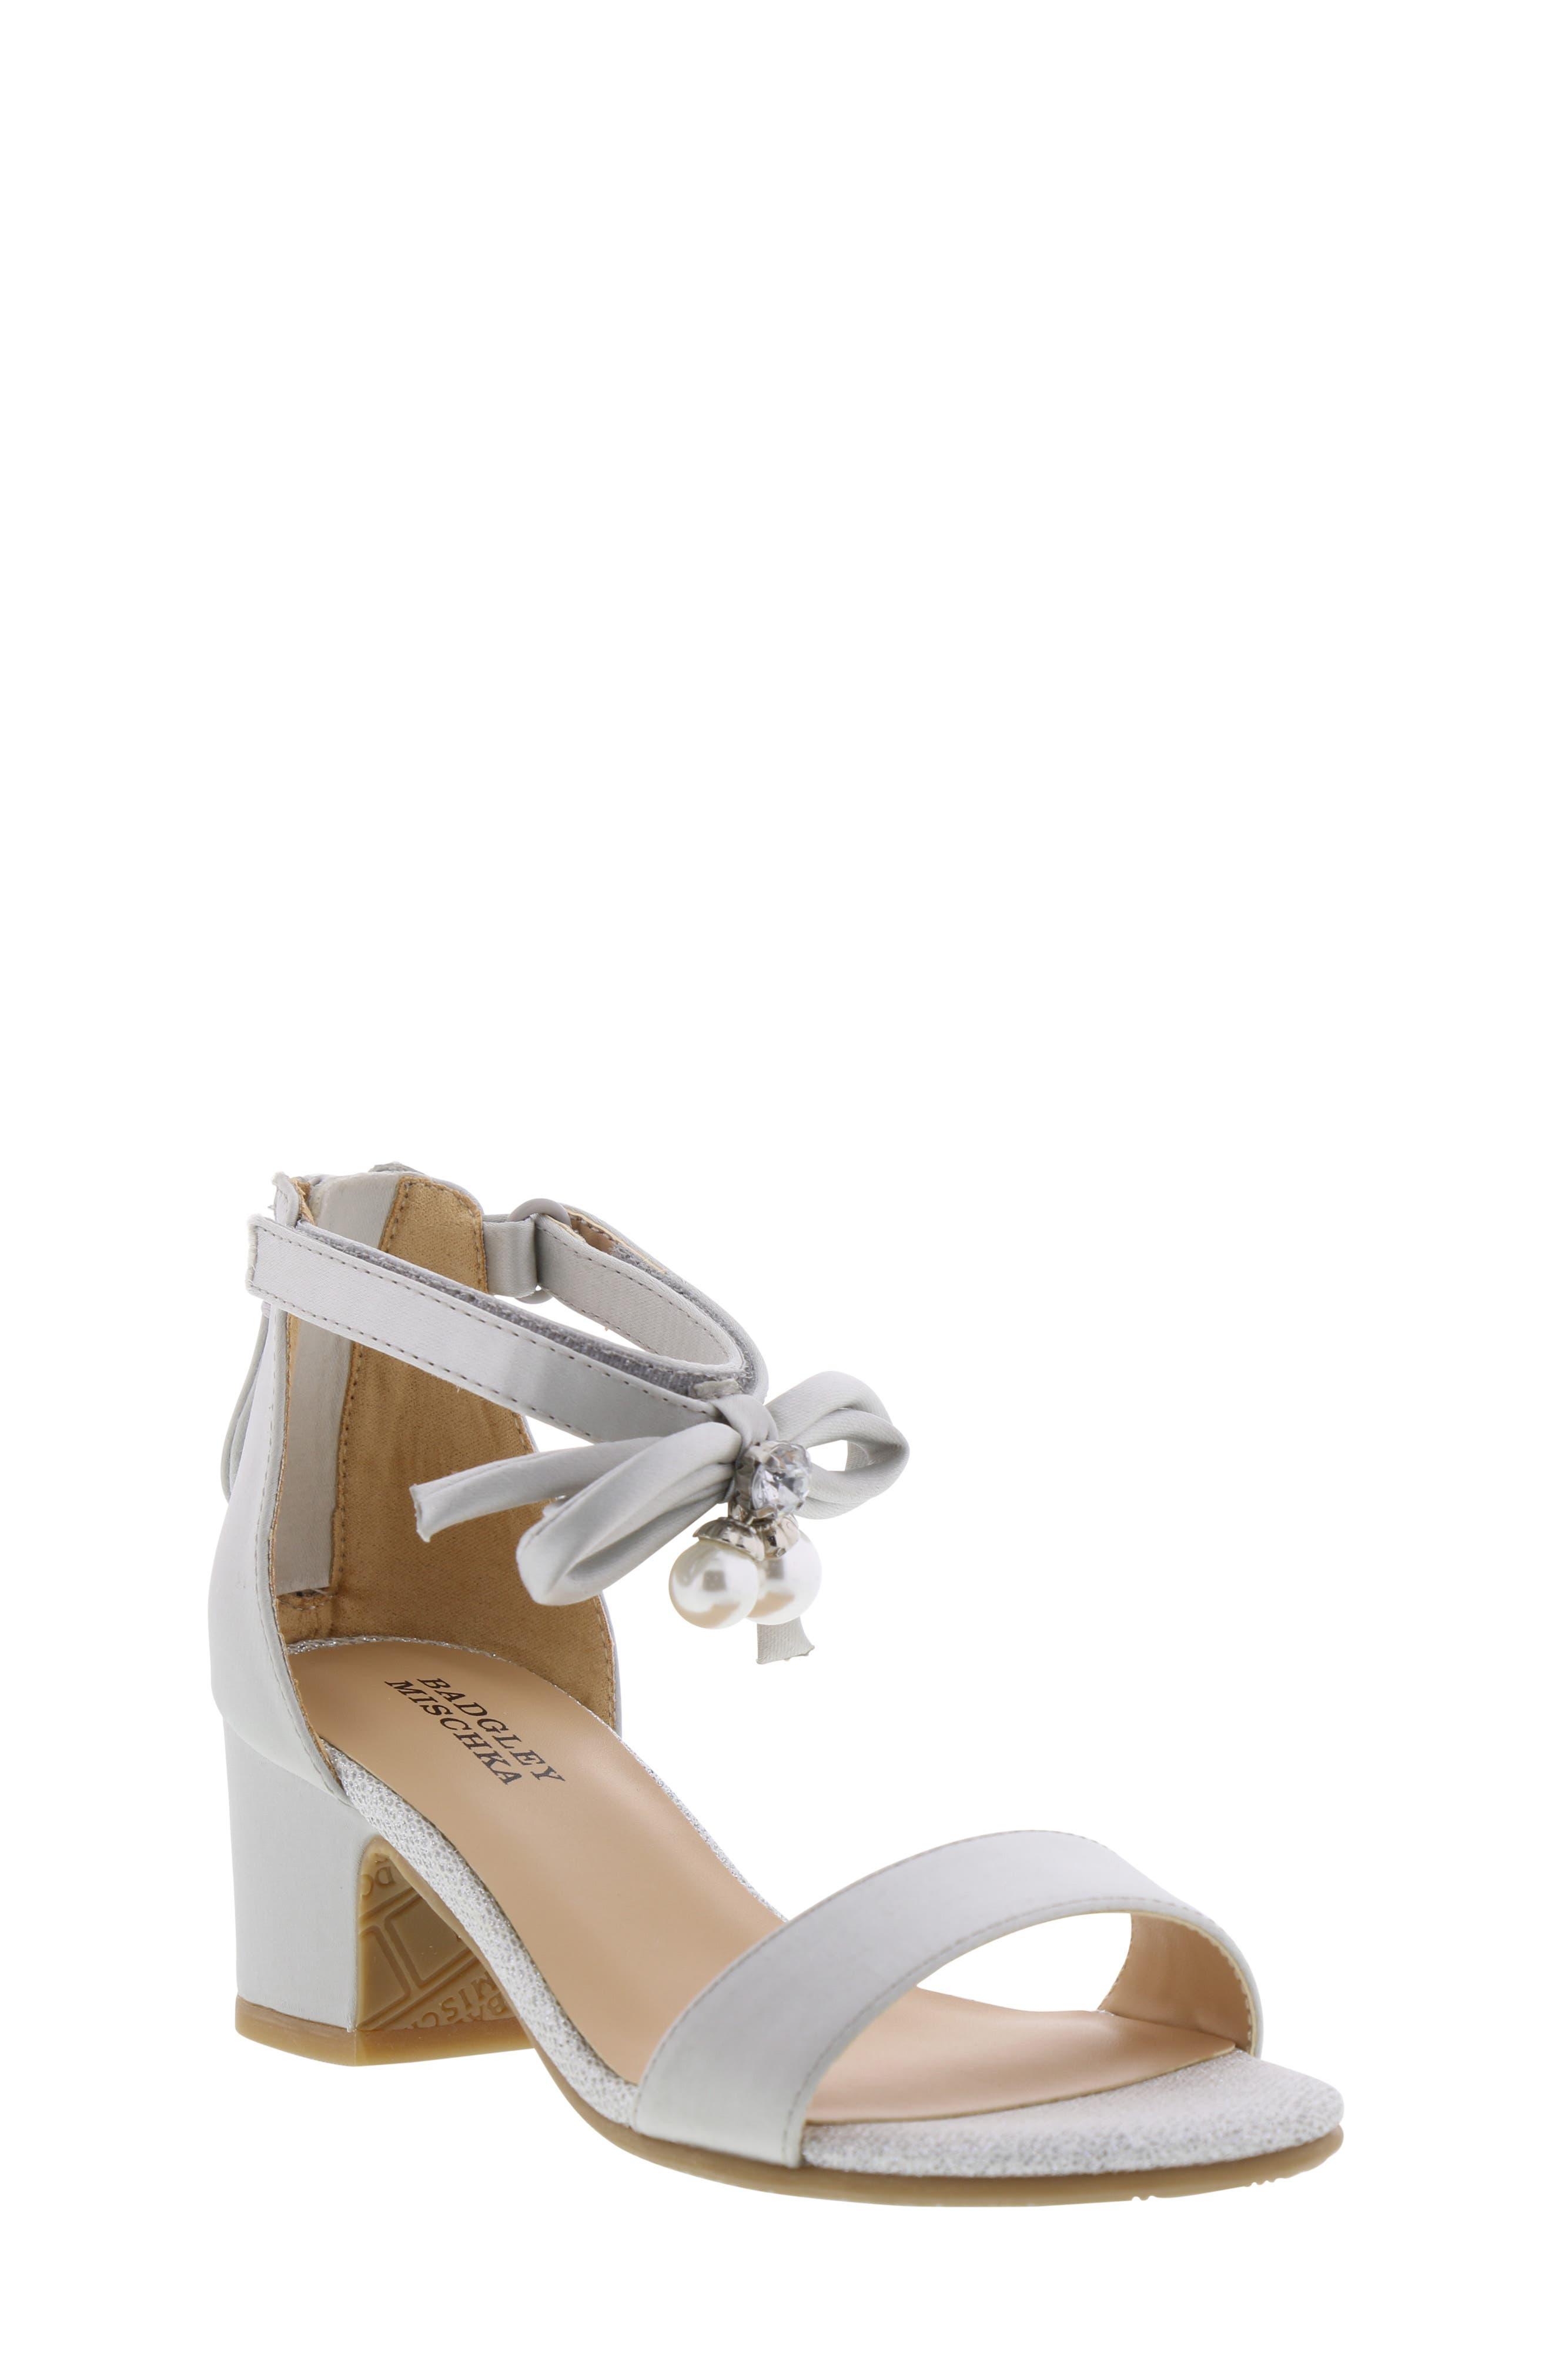 BADGLEY MISCHKA COLLECTION, Badgley Mischka Pernia Embellished Bow Sandal, Main thumbnail 1, color, SILVER